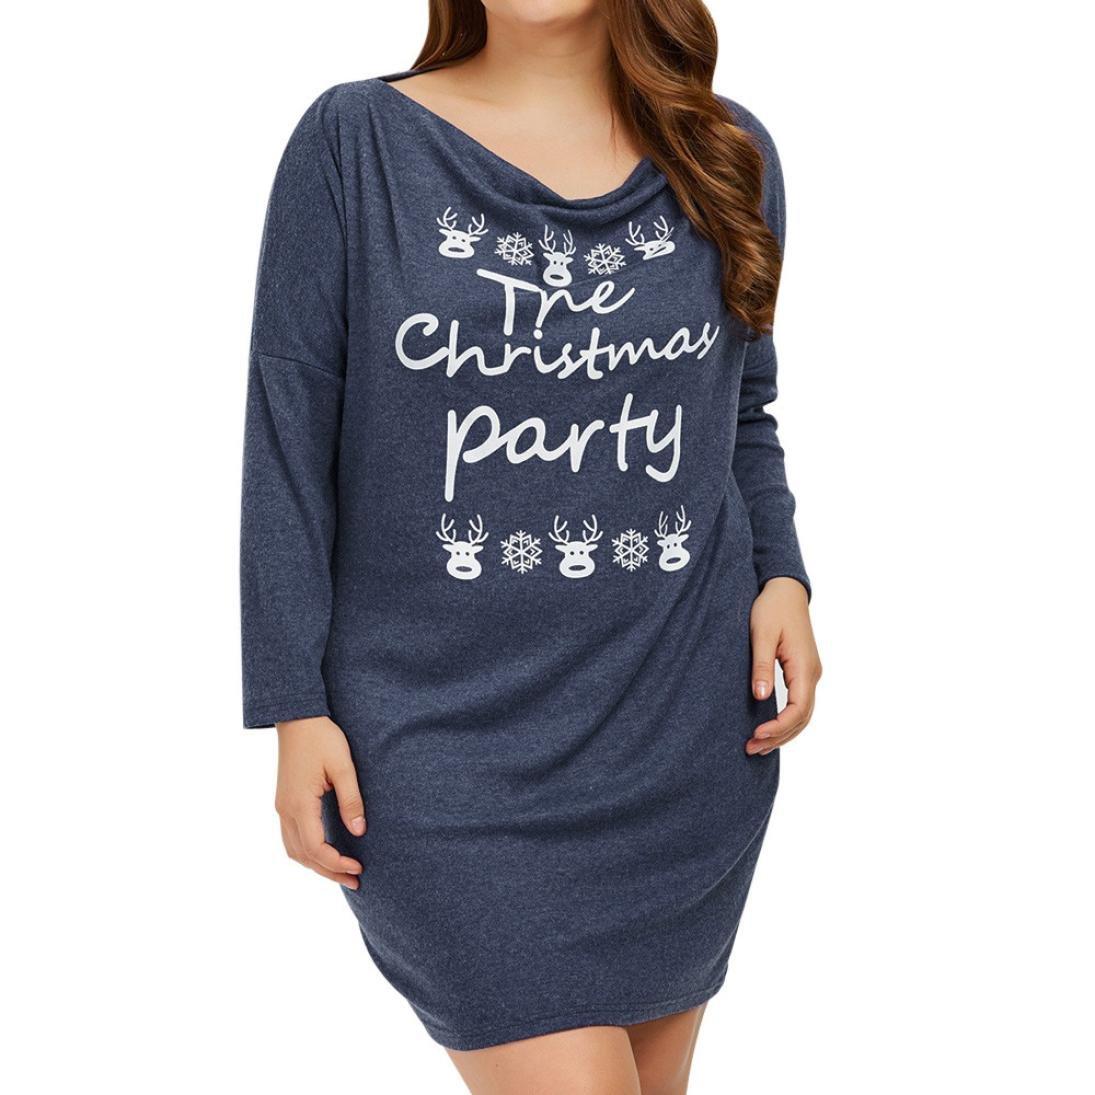 Women's Christmas dress,Toponly Women Cotton Blend Print Letters Plus Size Dress Christmas Party Casual Dress (Blue, XL)